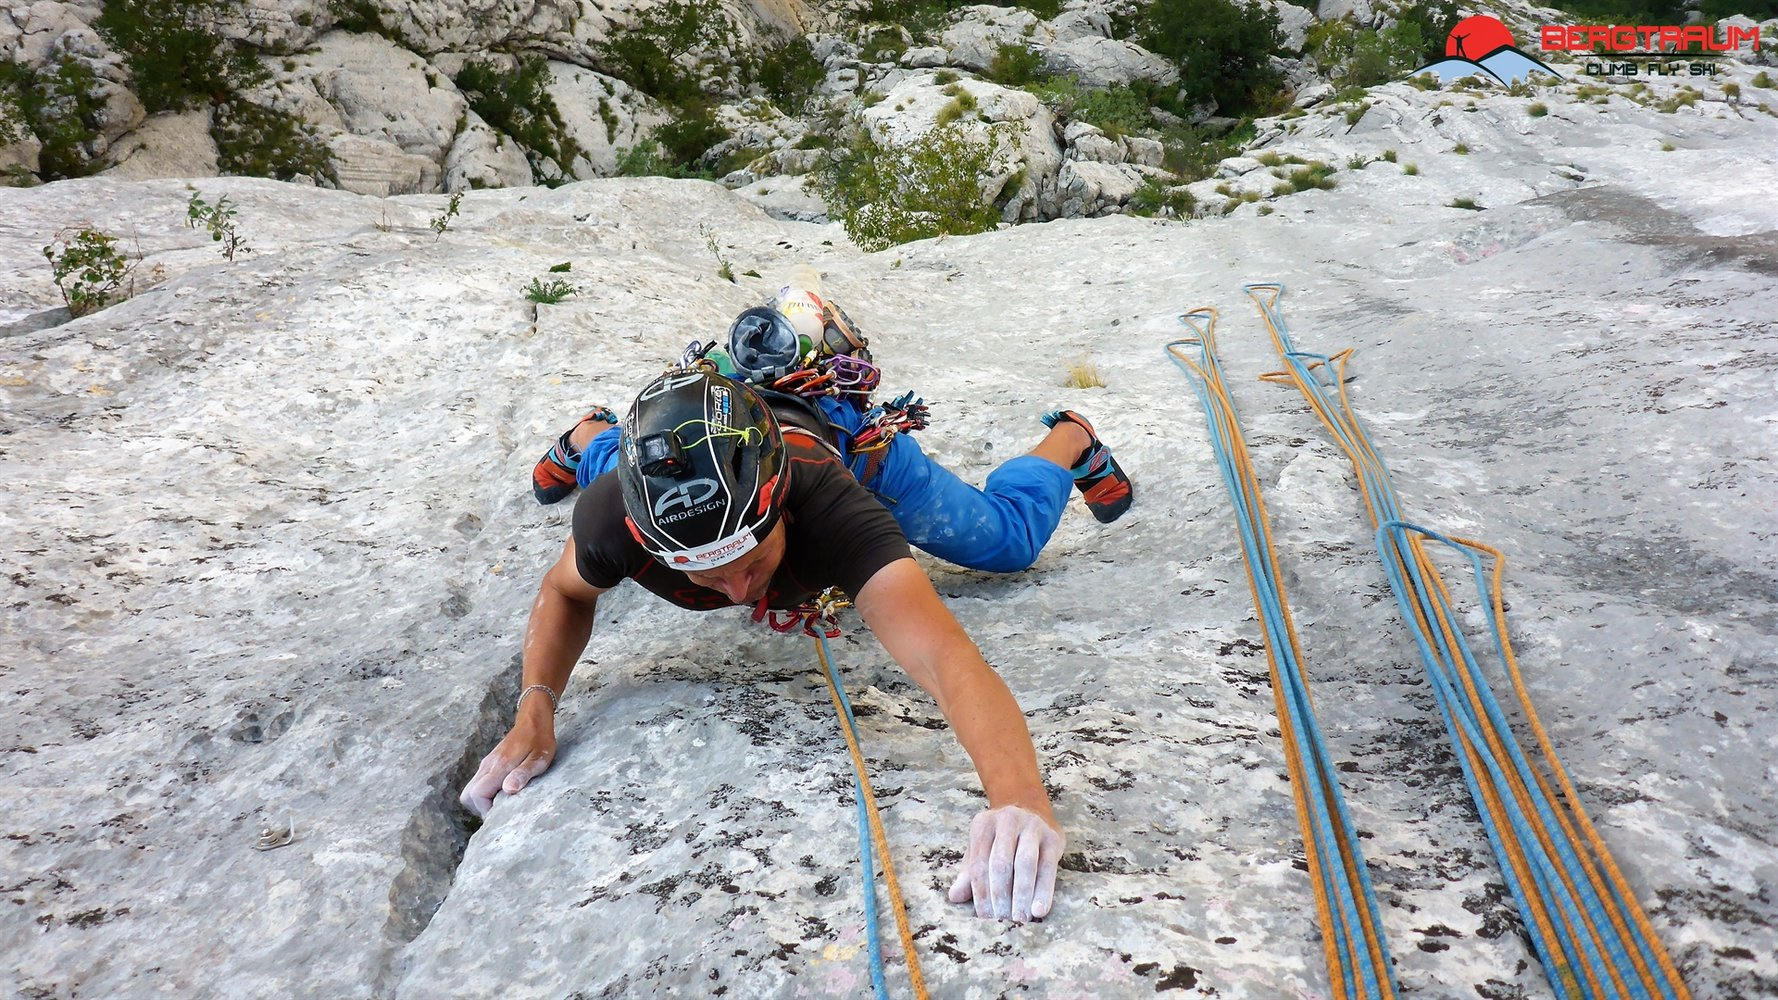 Kletterausrüstung Zug : Infinito bergsteigen.com